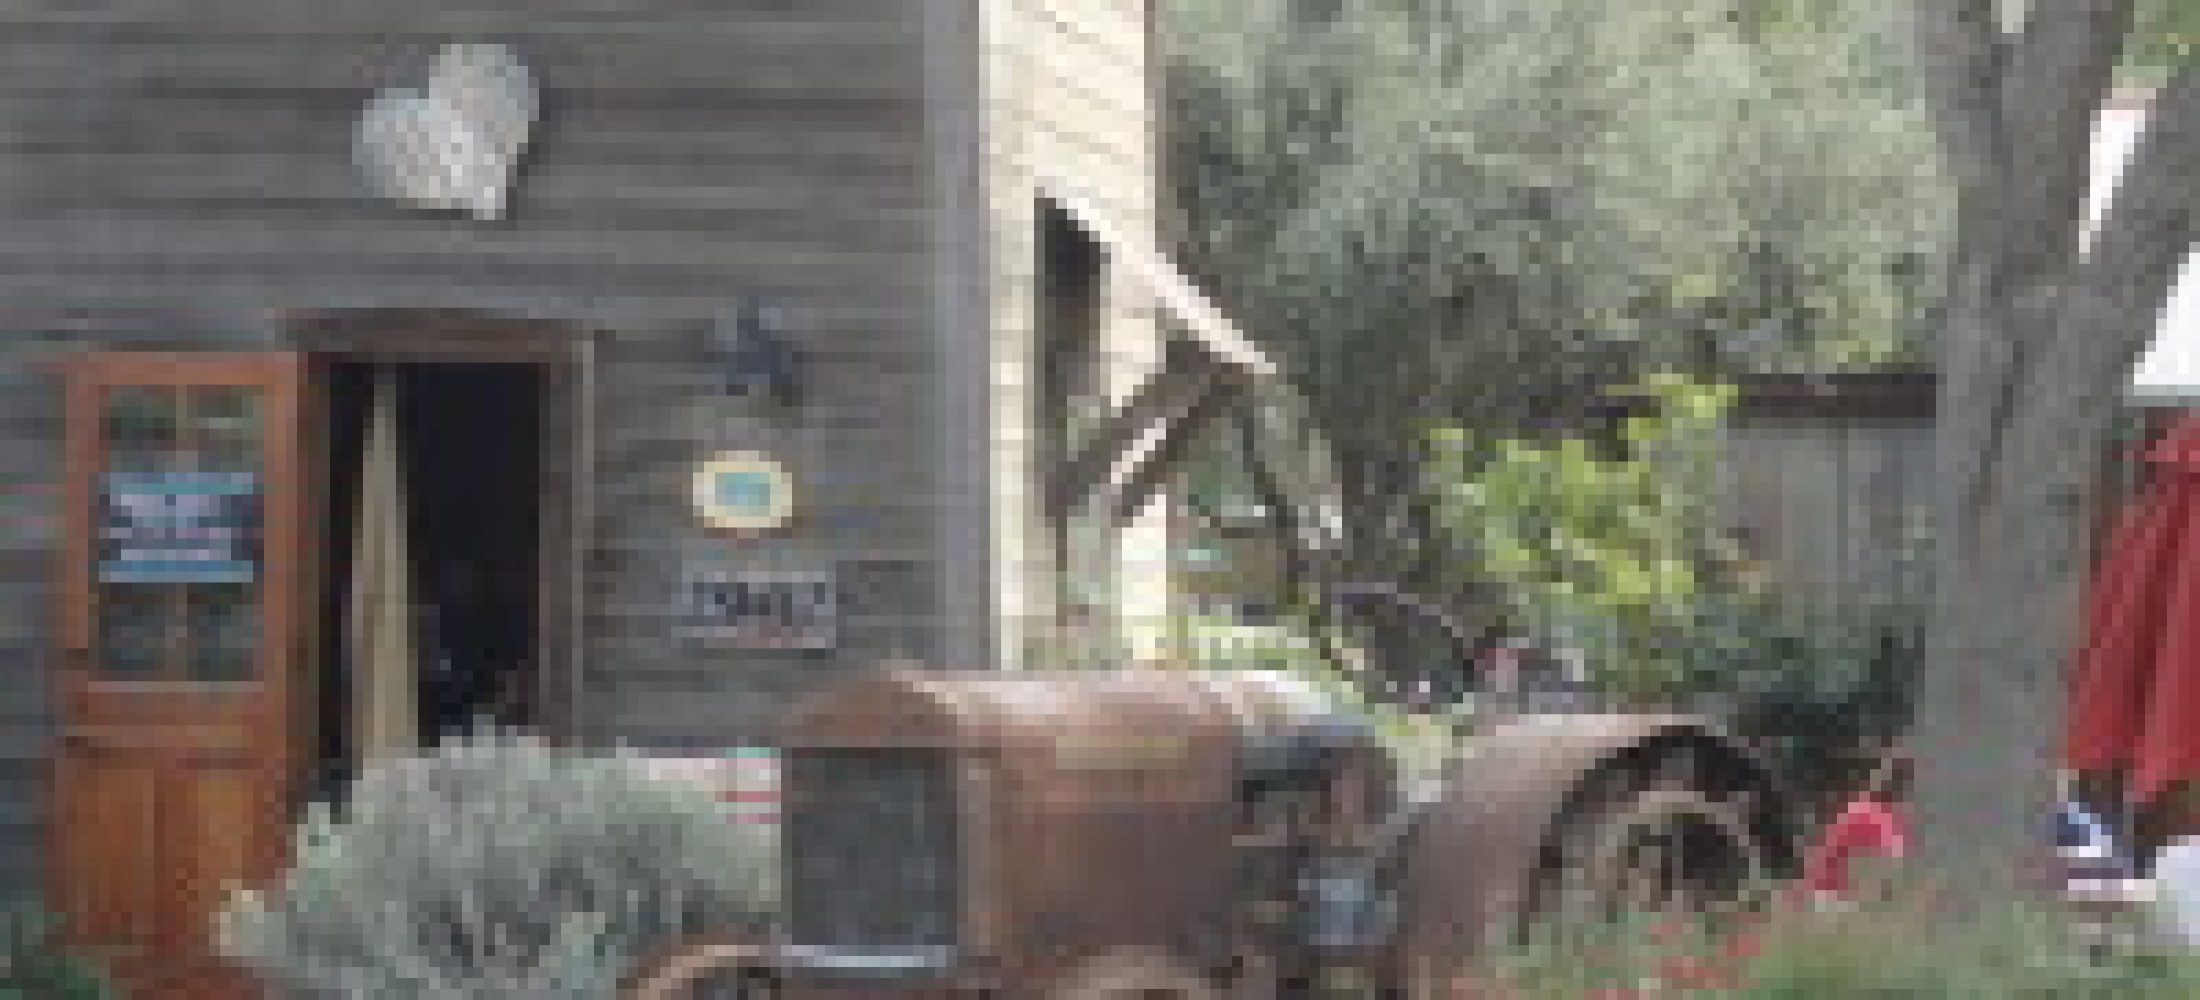 Los Olivos, In the California Countryside